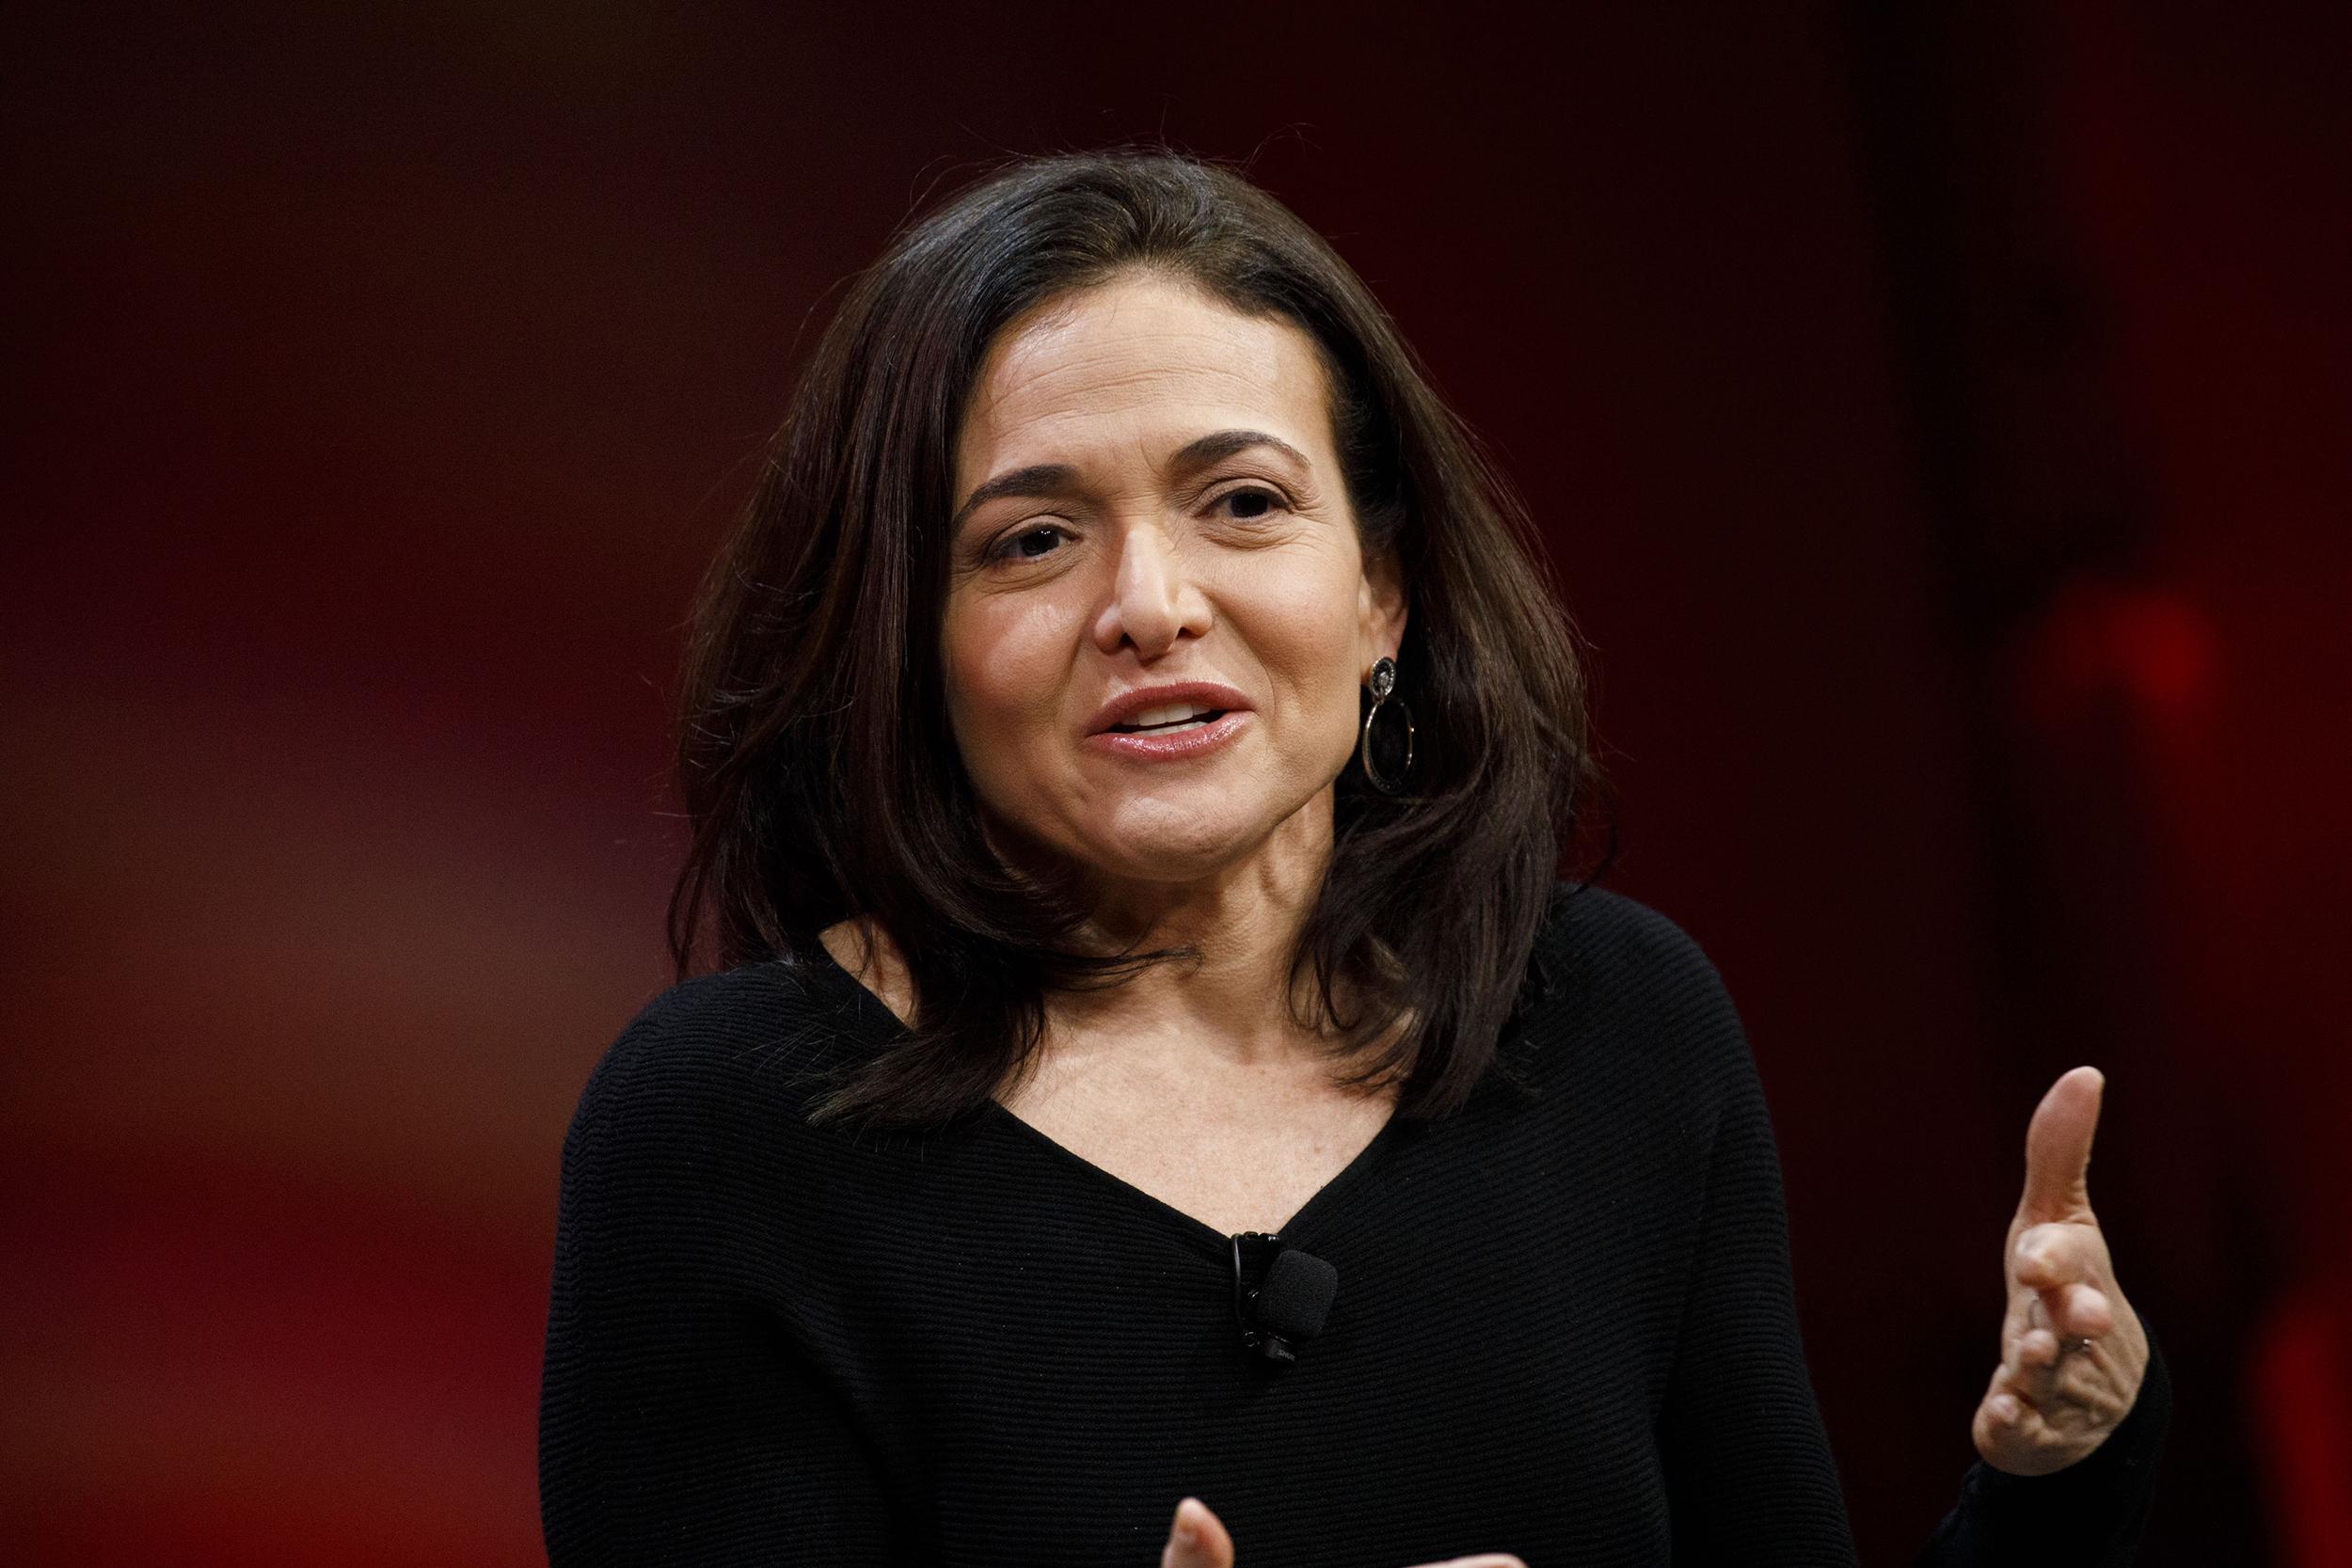 Facebook's Sandberg asked company to probe George Soros